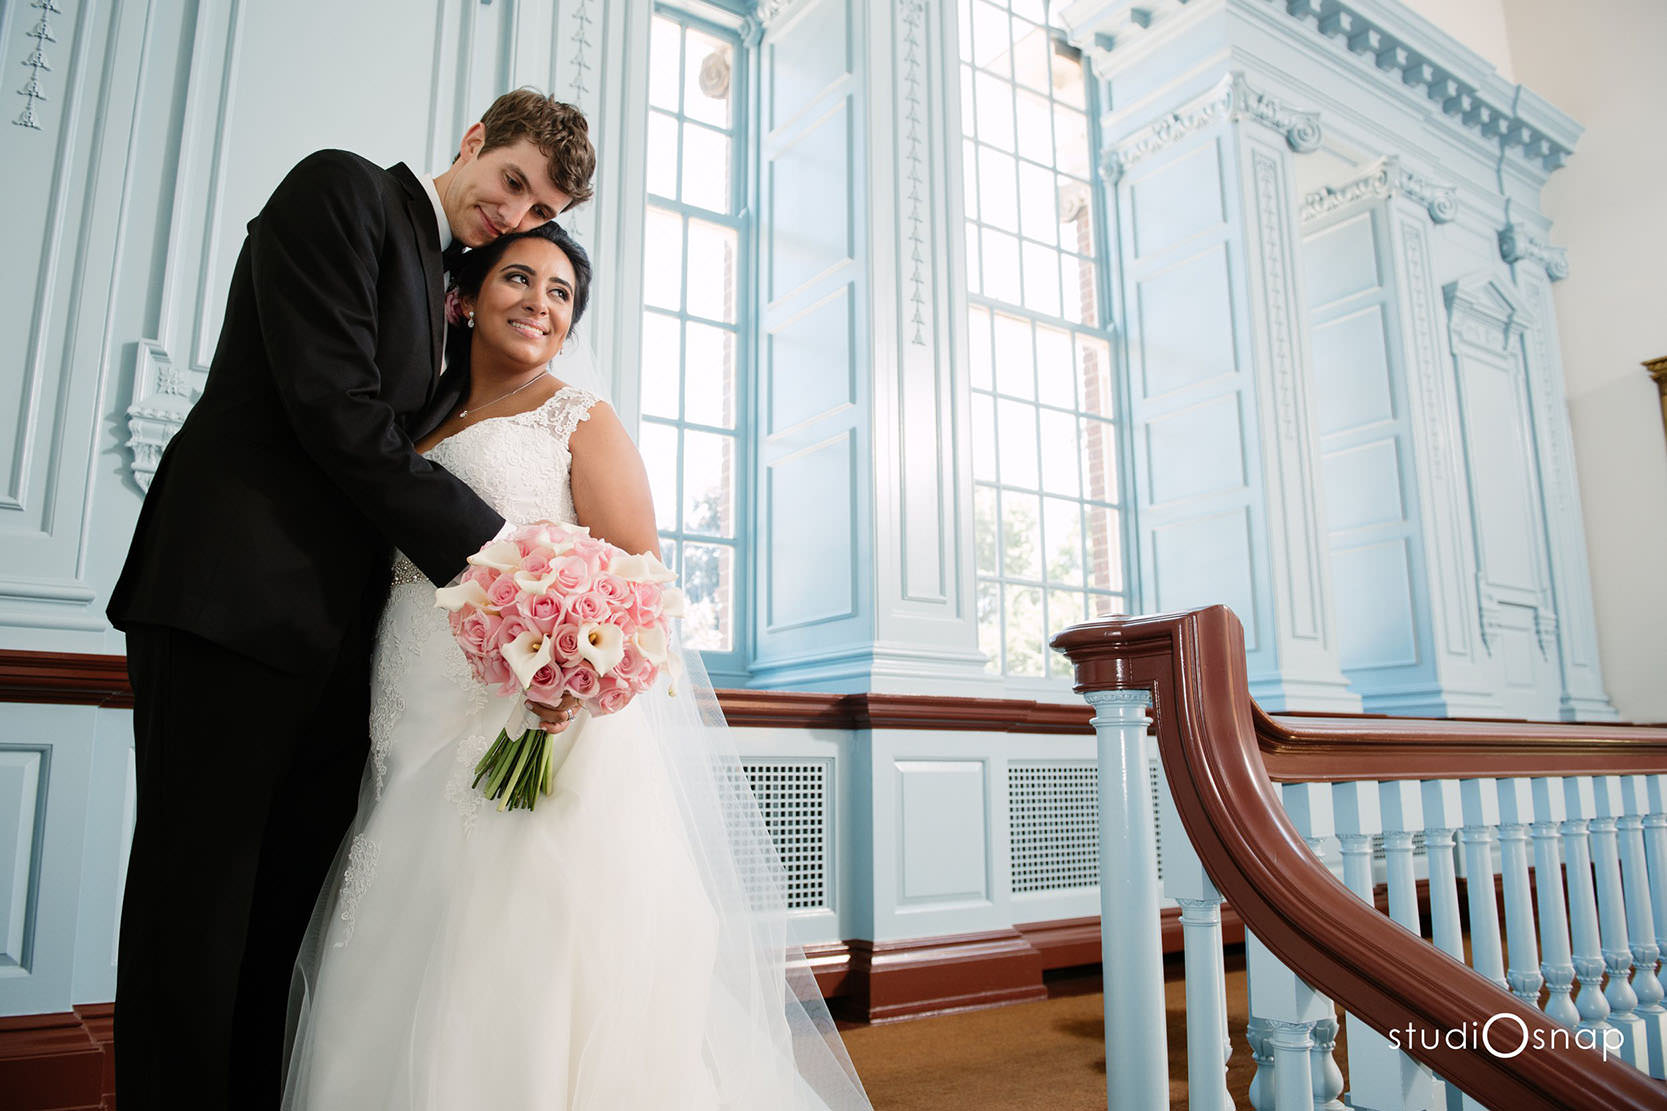 Lovett Hall Wedding At The Henry Ford Museum Detroit Photographer